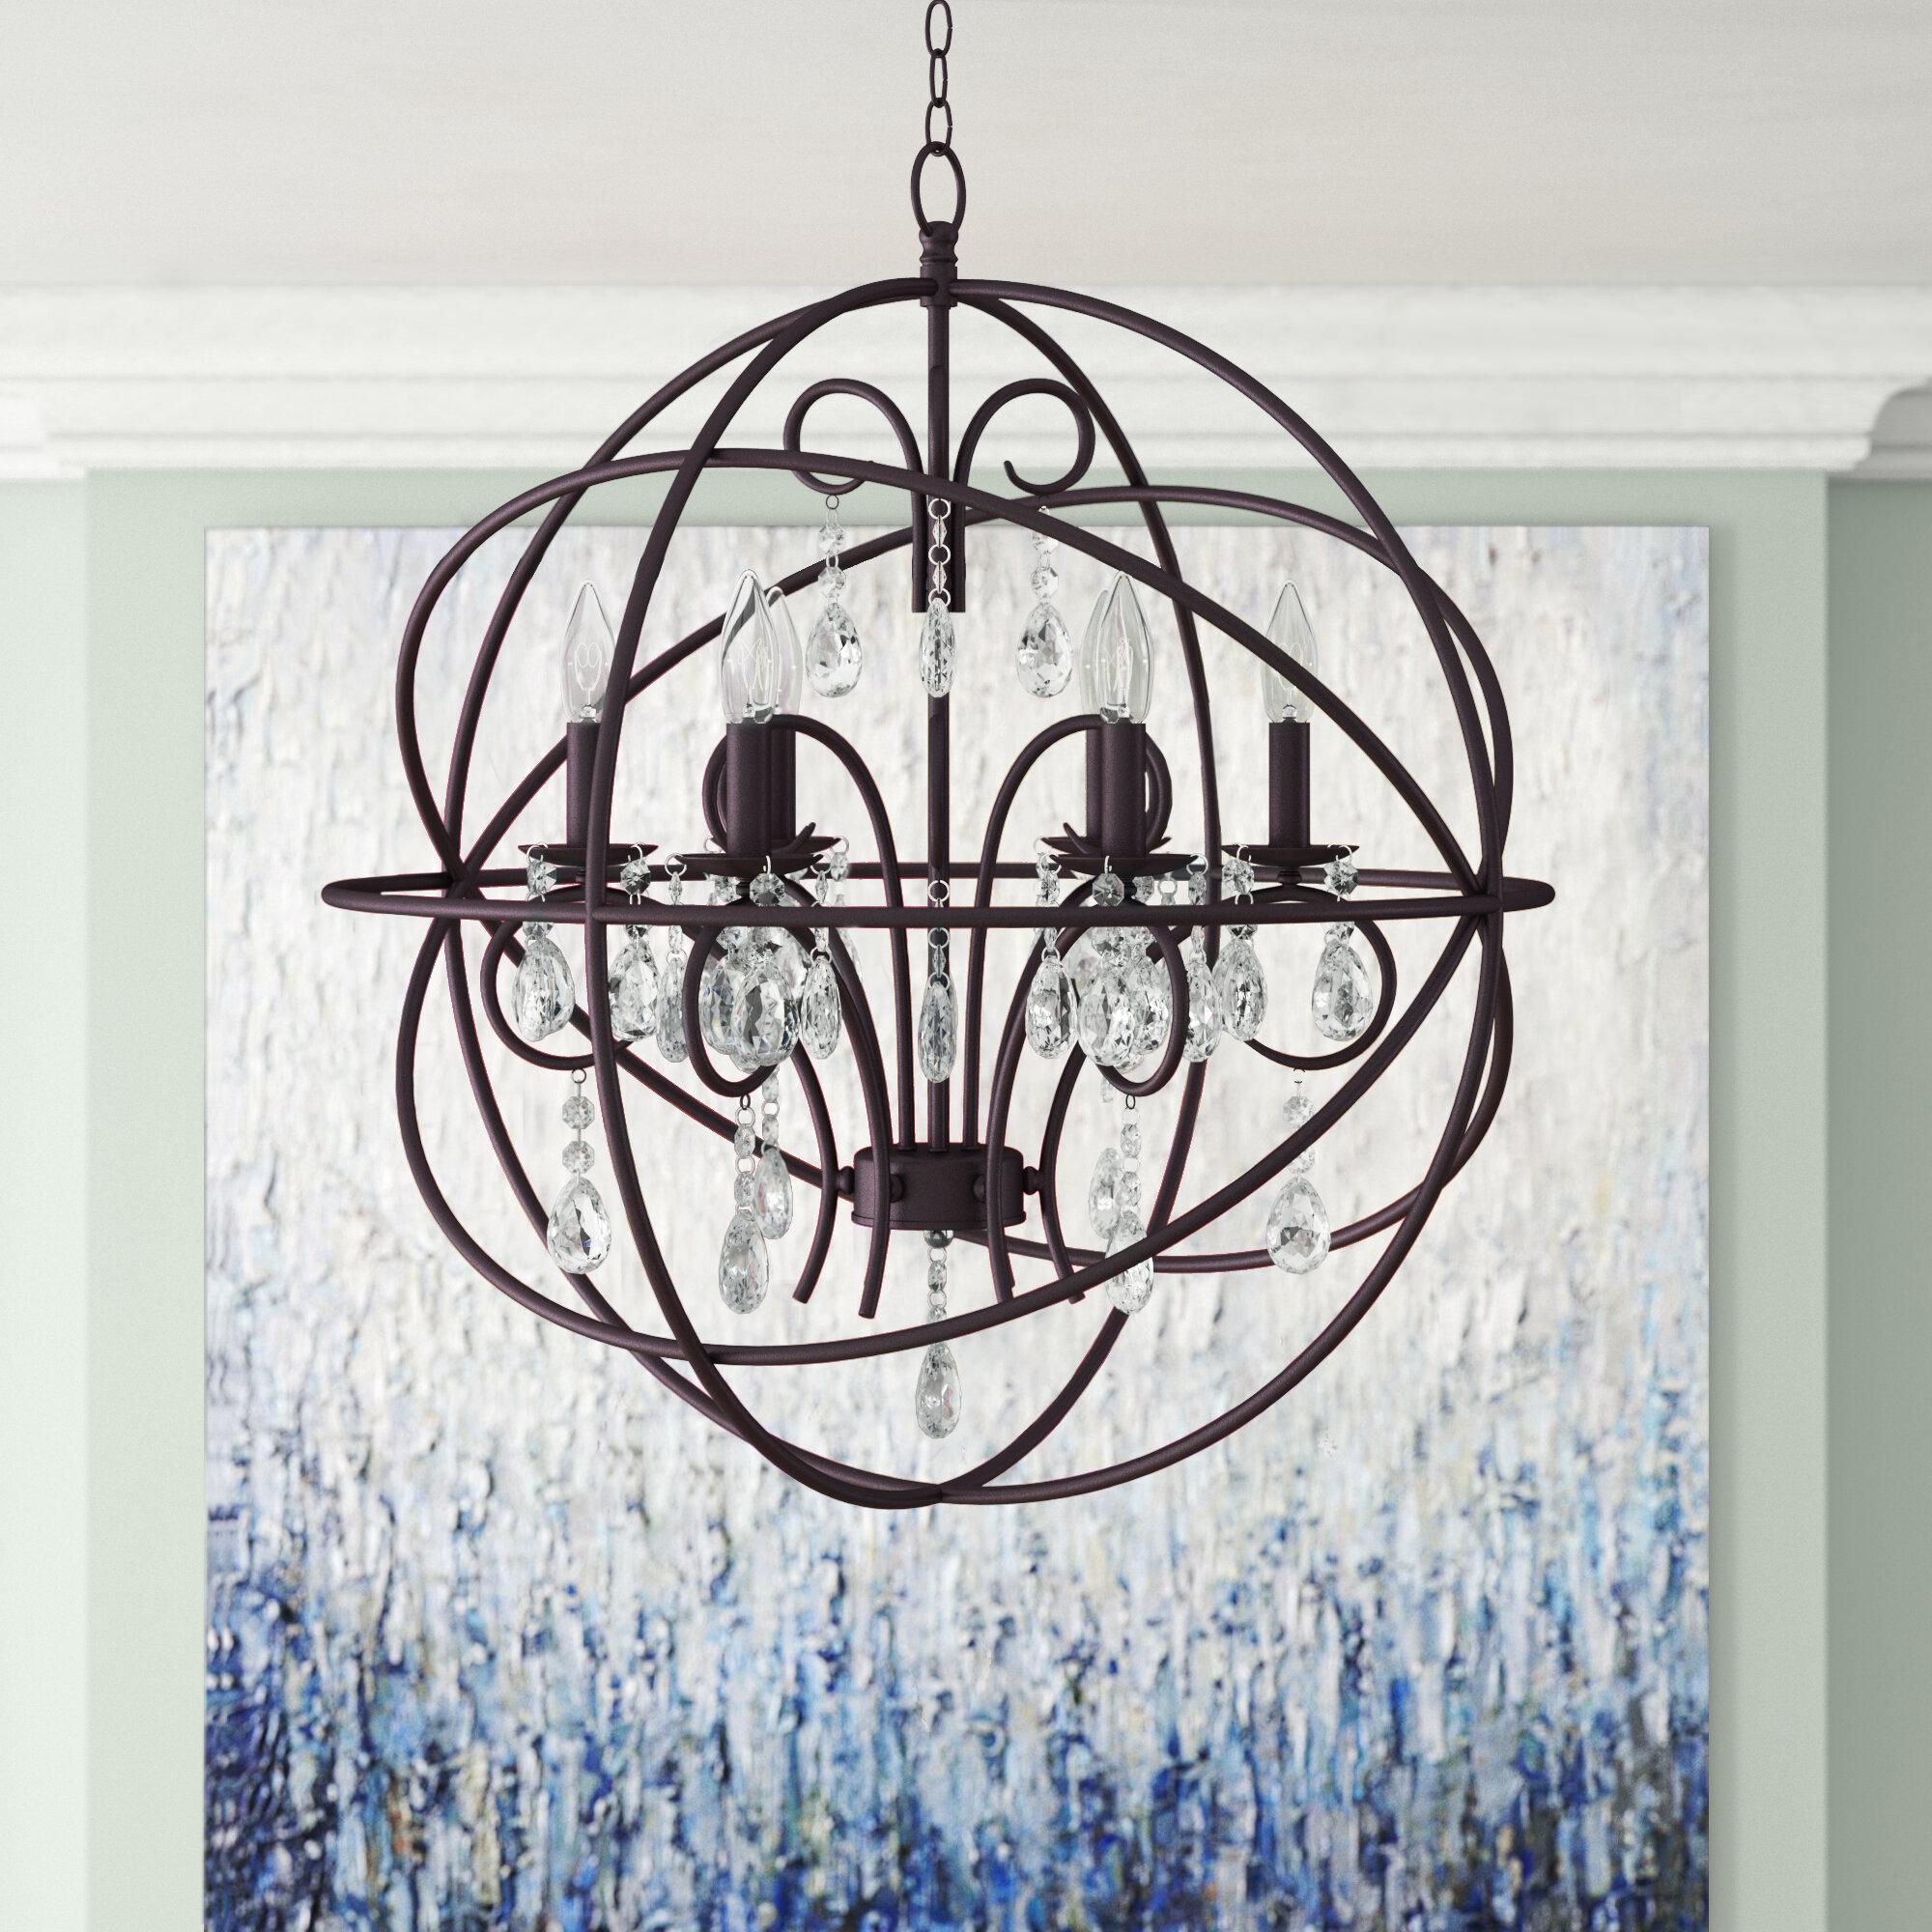 Willa Arlo Interiors Alden 6 Light Globe Chandelier Intended For Alden 6 Light Globe Chandeliers (View 2 of 30)